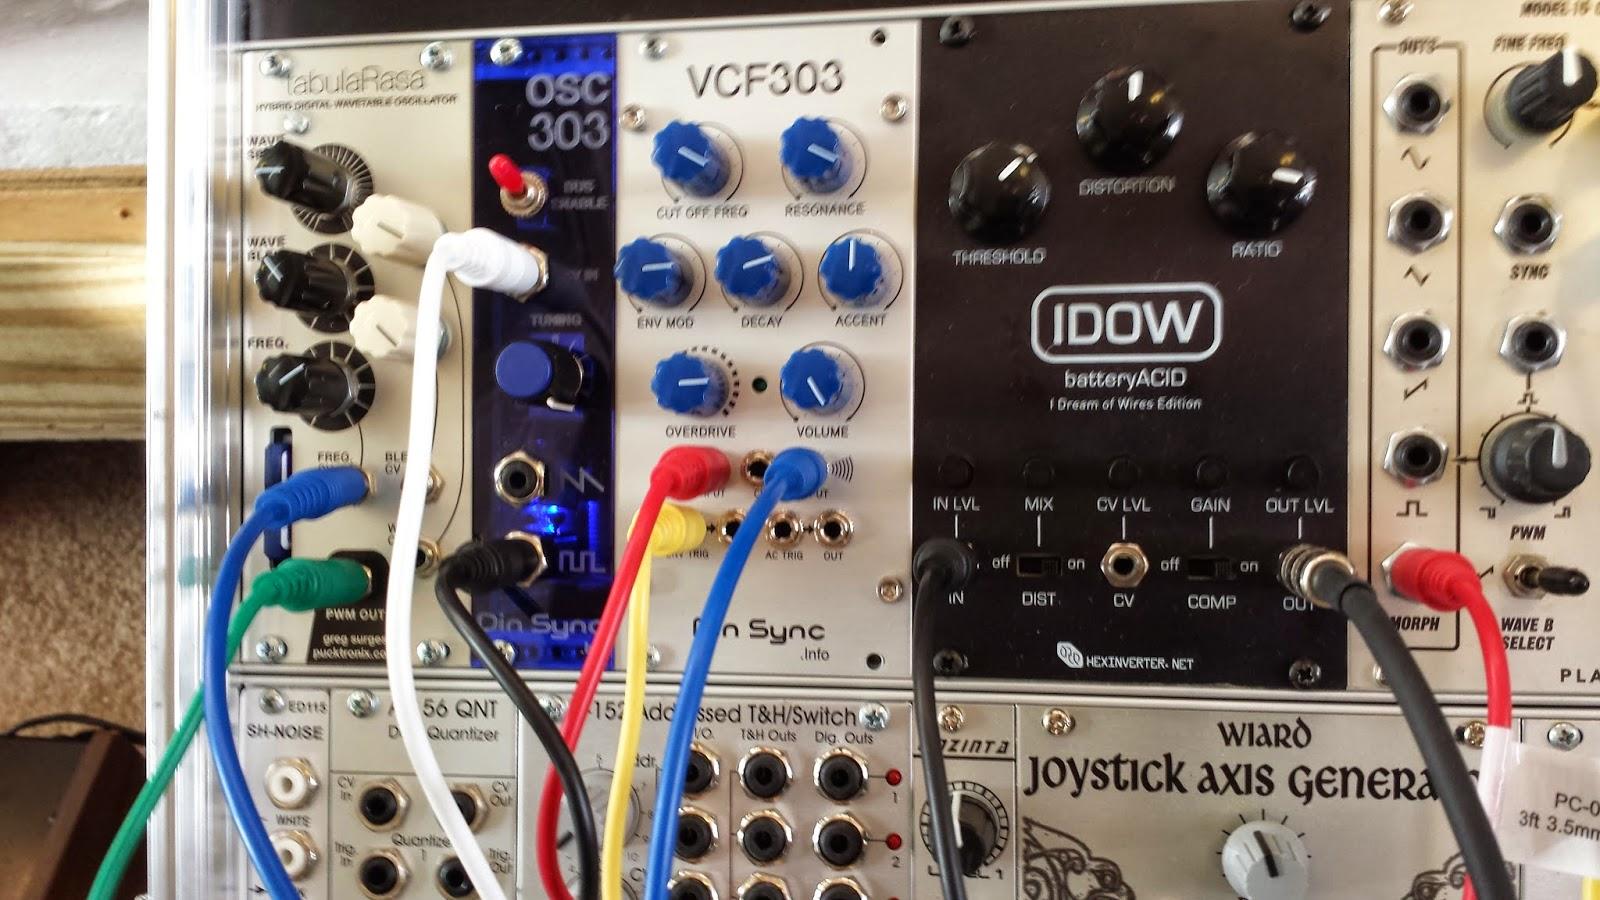 Jondent exploring electronic music dinsync 303 acid for Acid electronic music